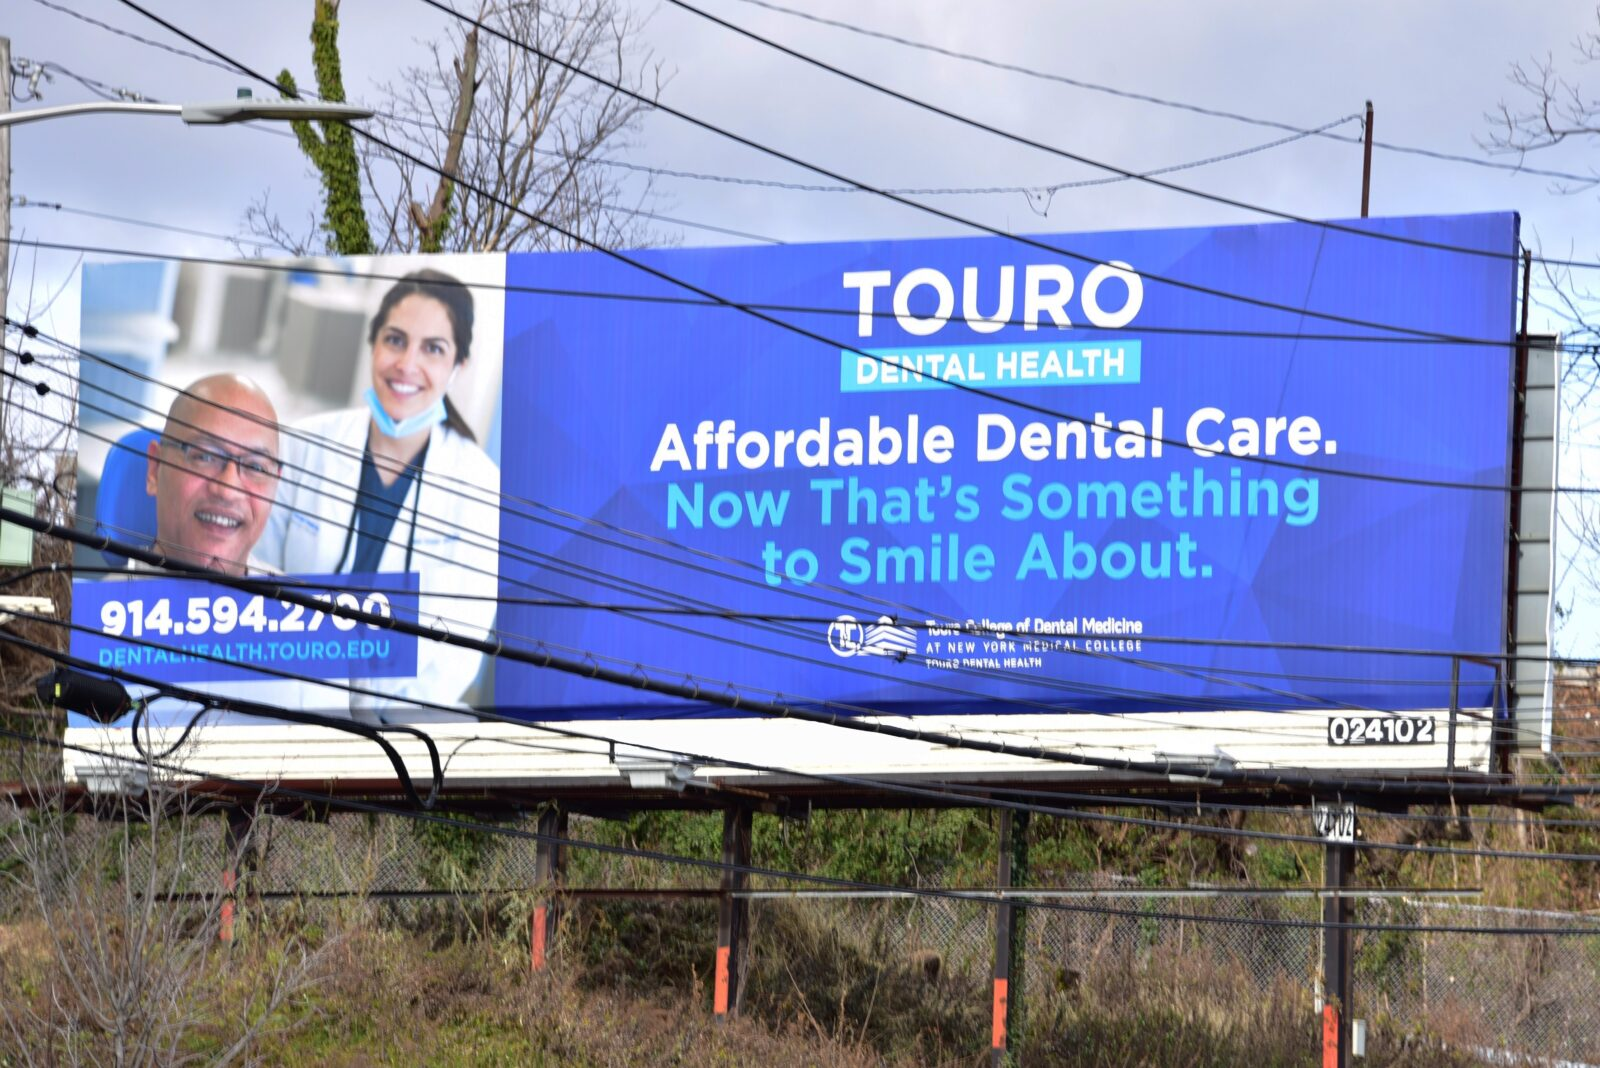 Touro College Billboard Advertising